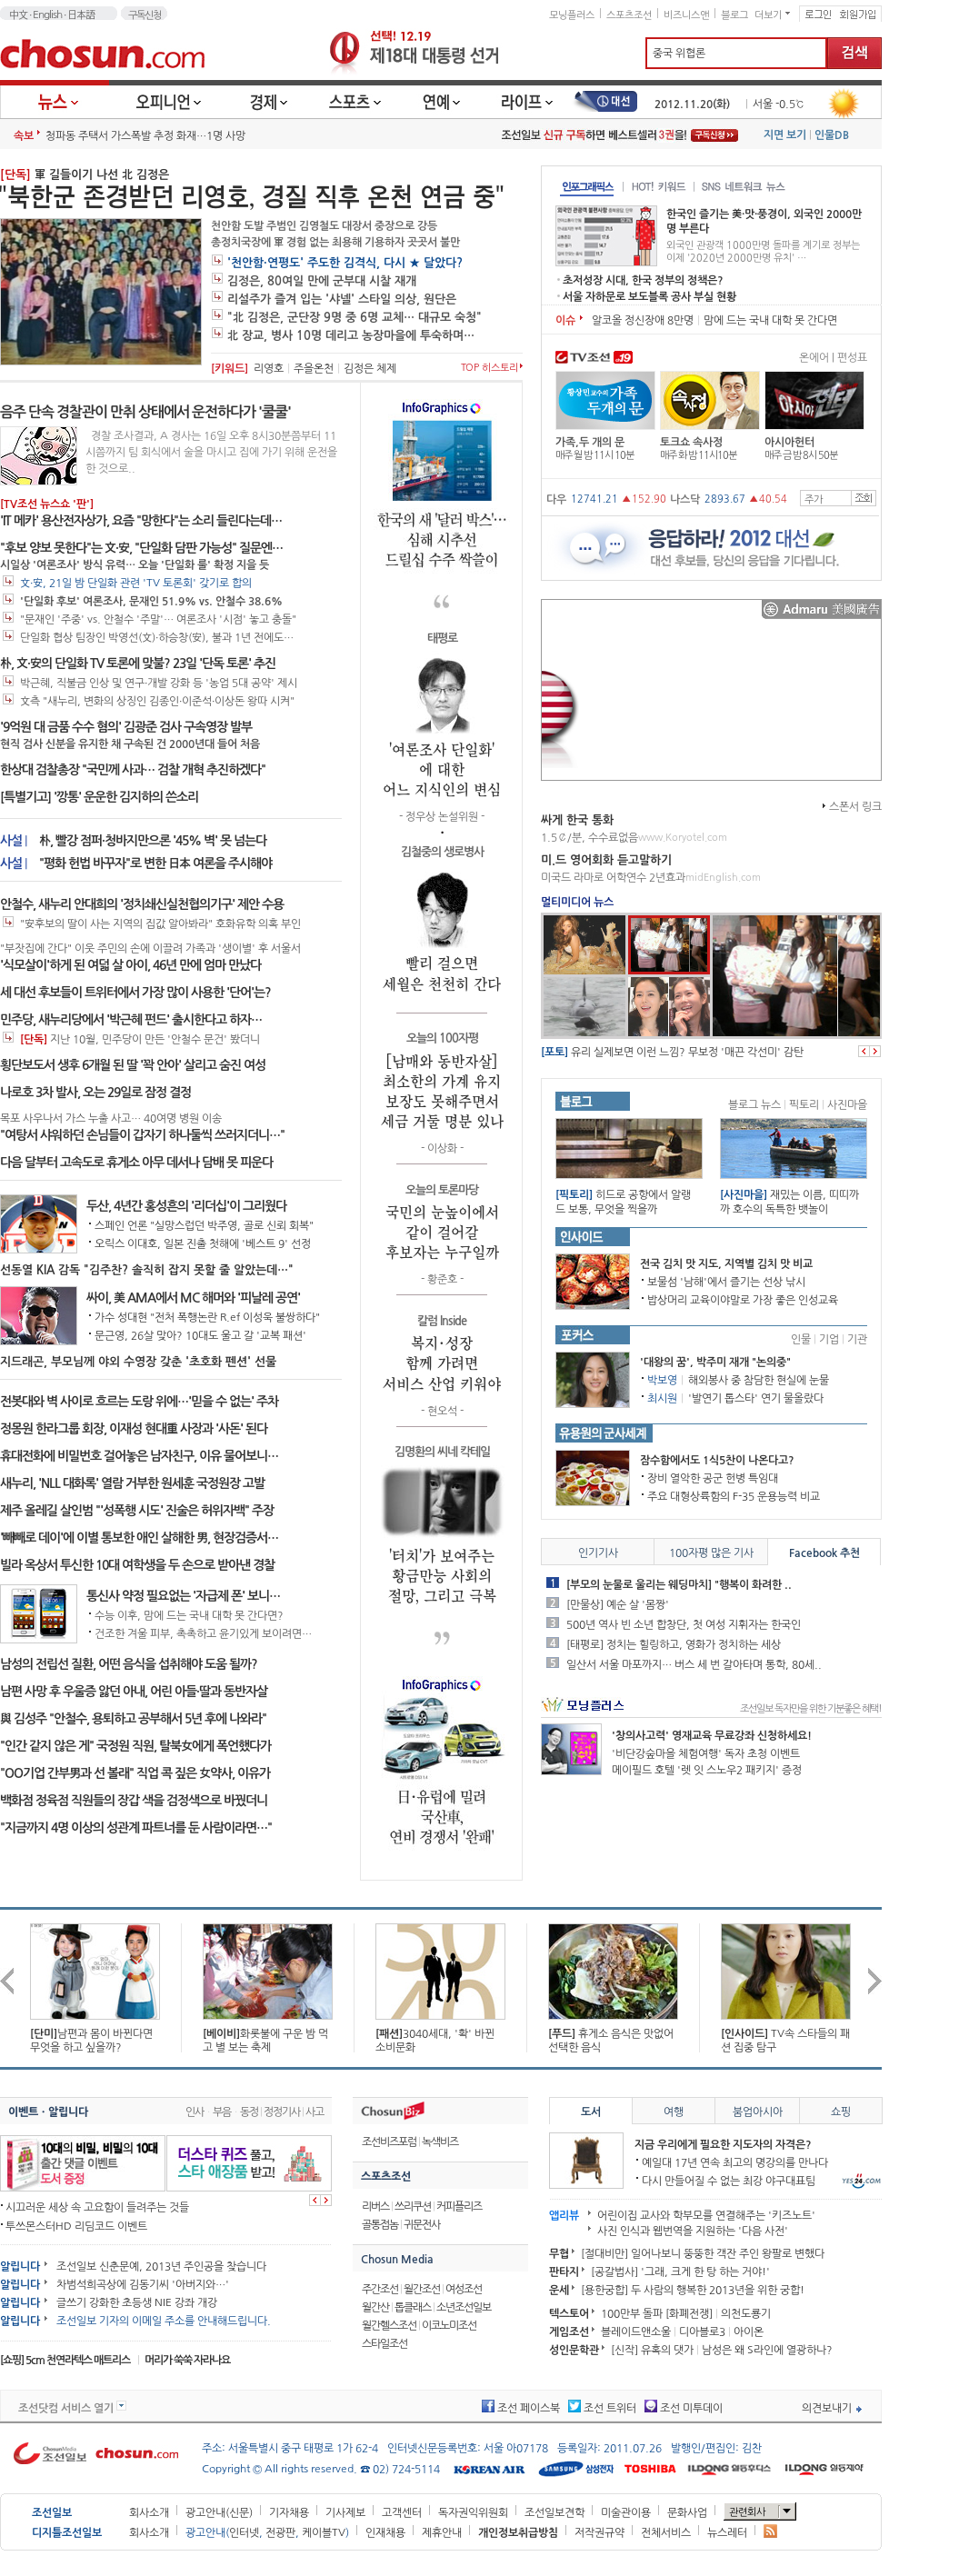 chosun.com at Monday Nov. 19, 2012, 4:04 p.m. UTC